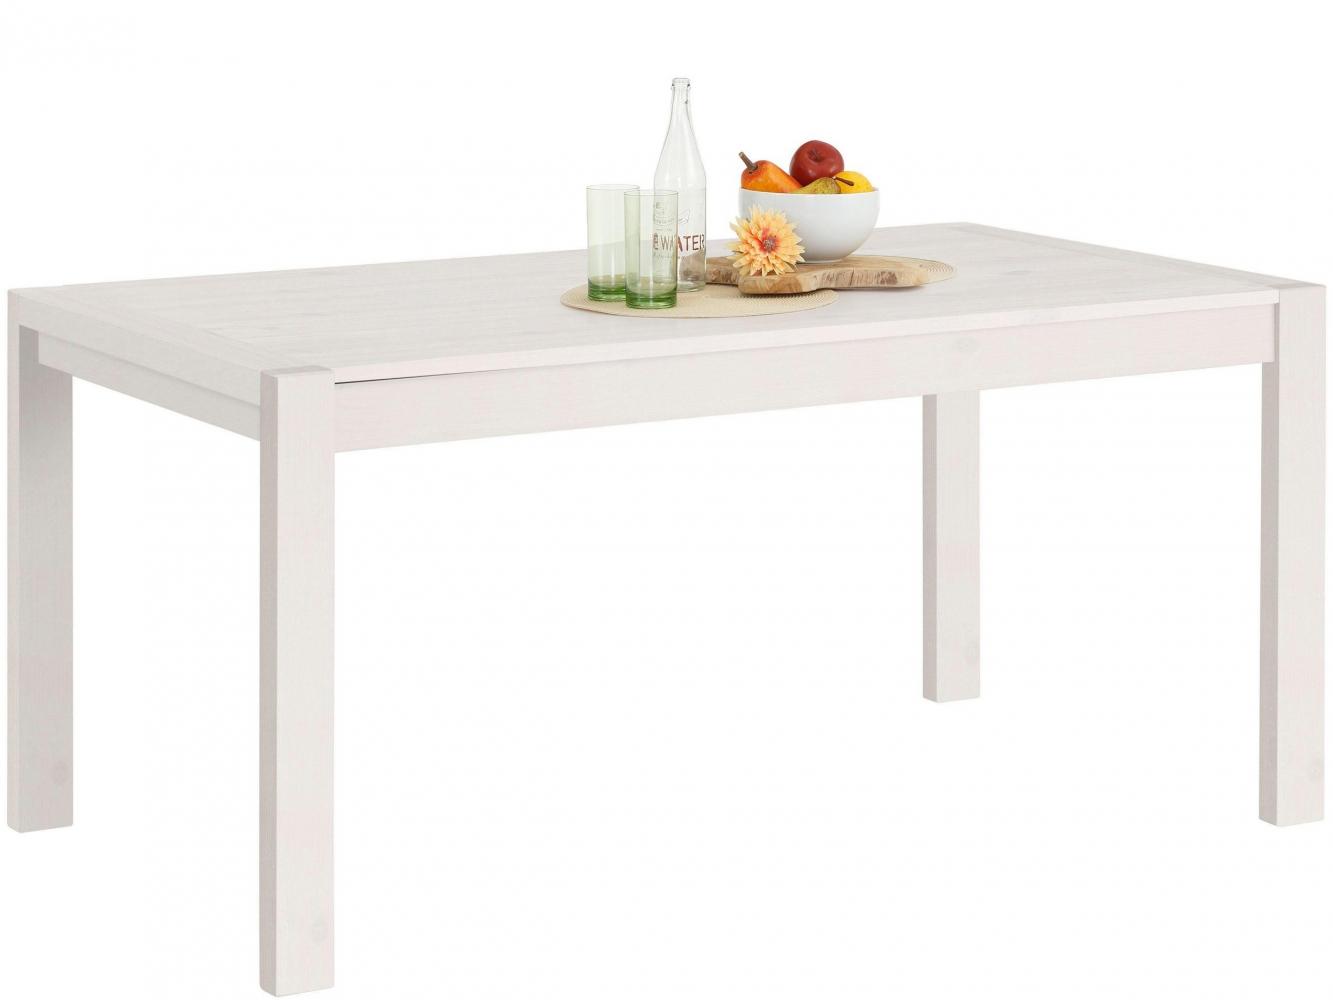 Jídelní stůl Alla, 160 cm, bílá